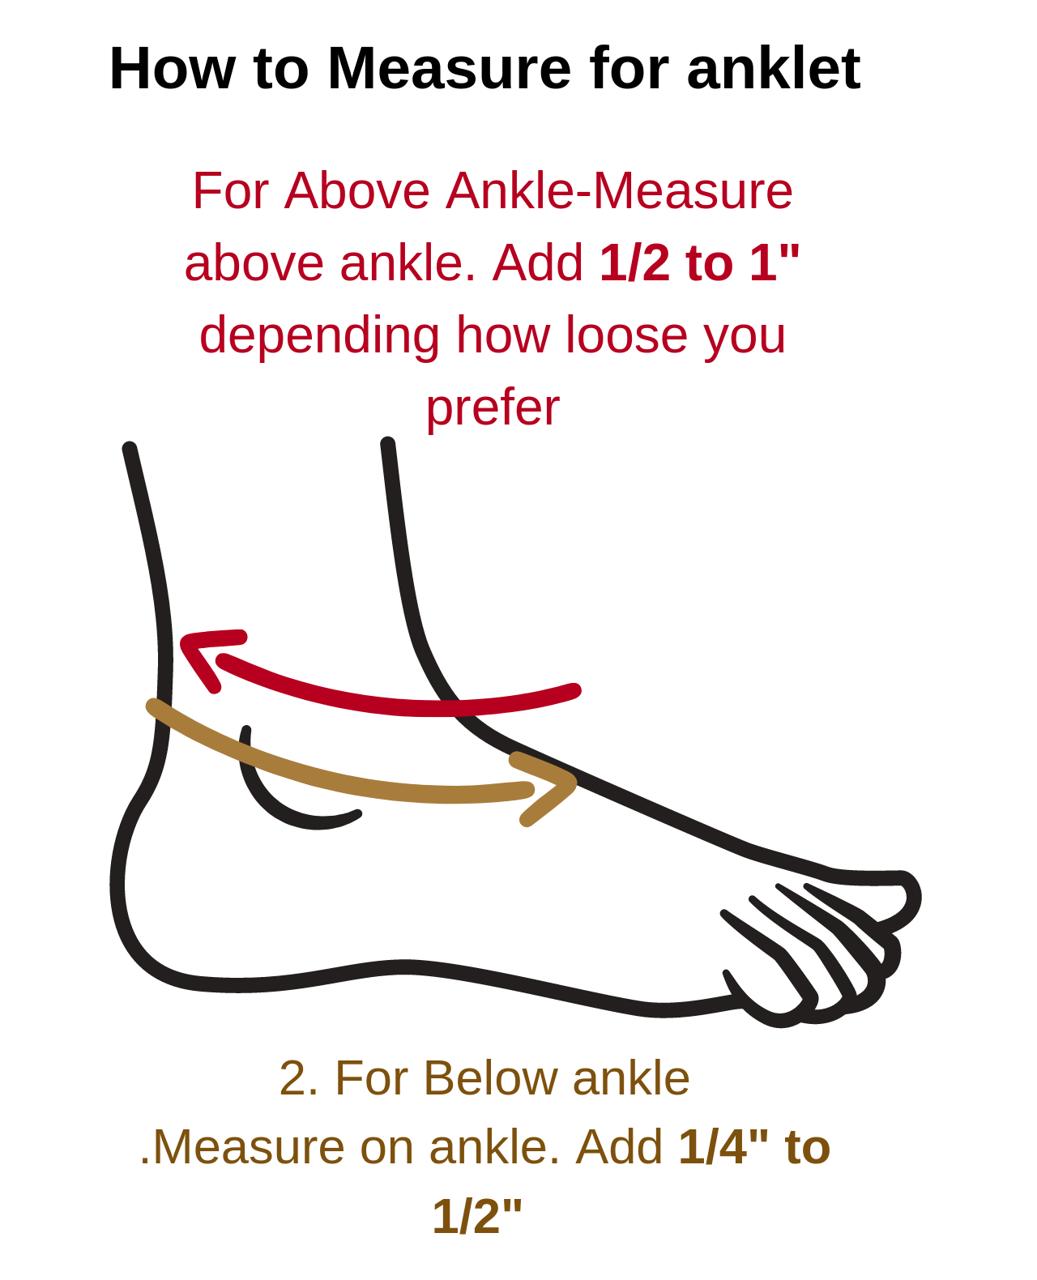 anklet measuring size guide image